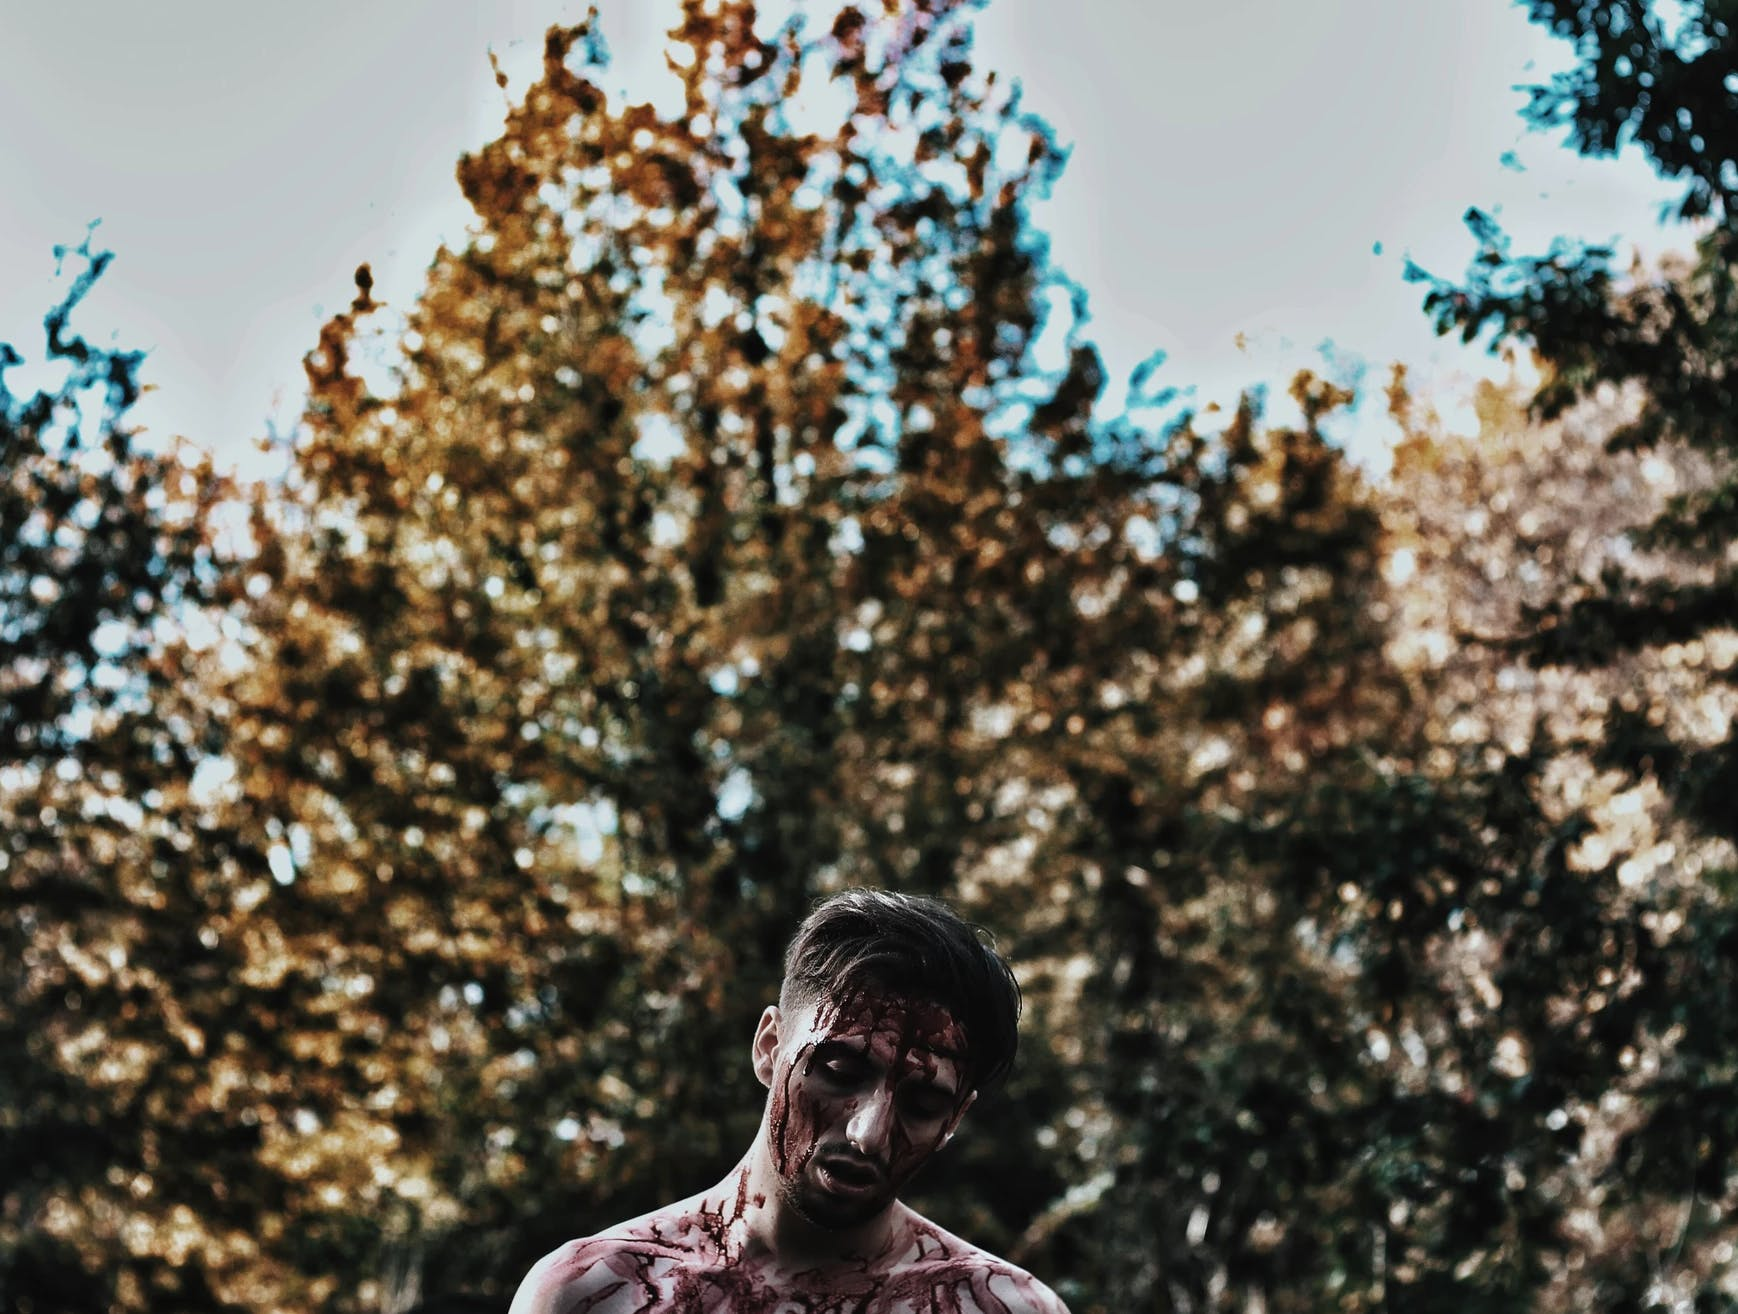 Kostenloses Stock Foto zu landschaft, mann, person, bäume